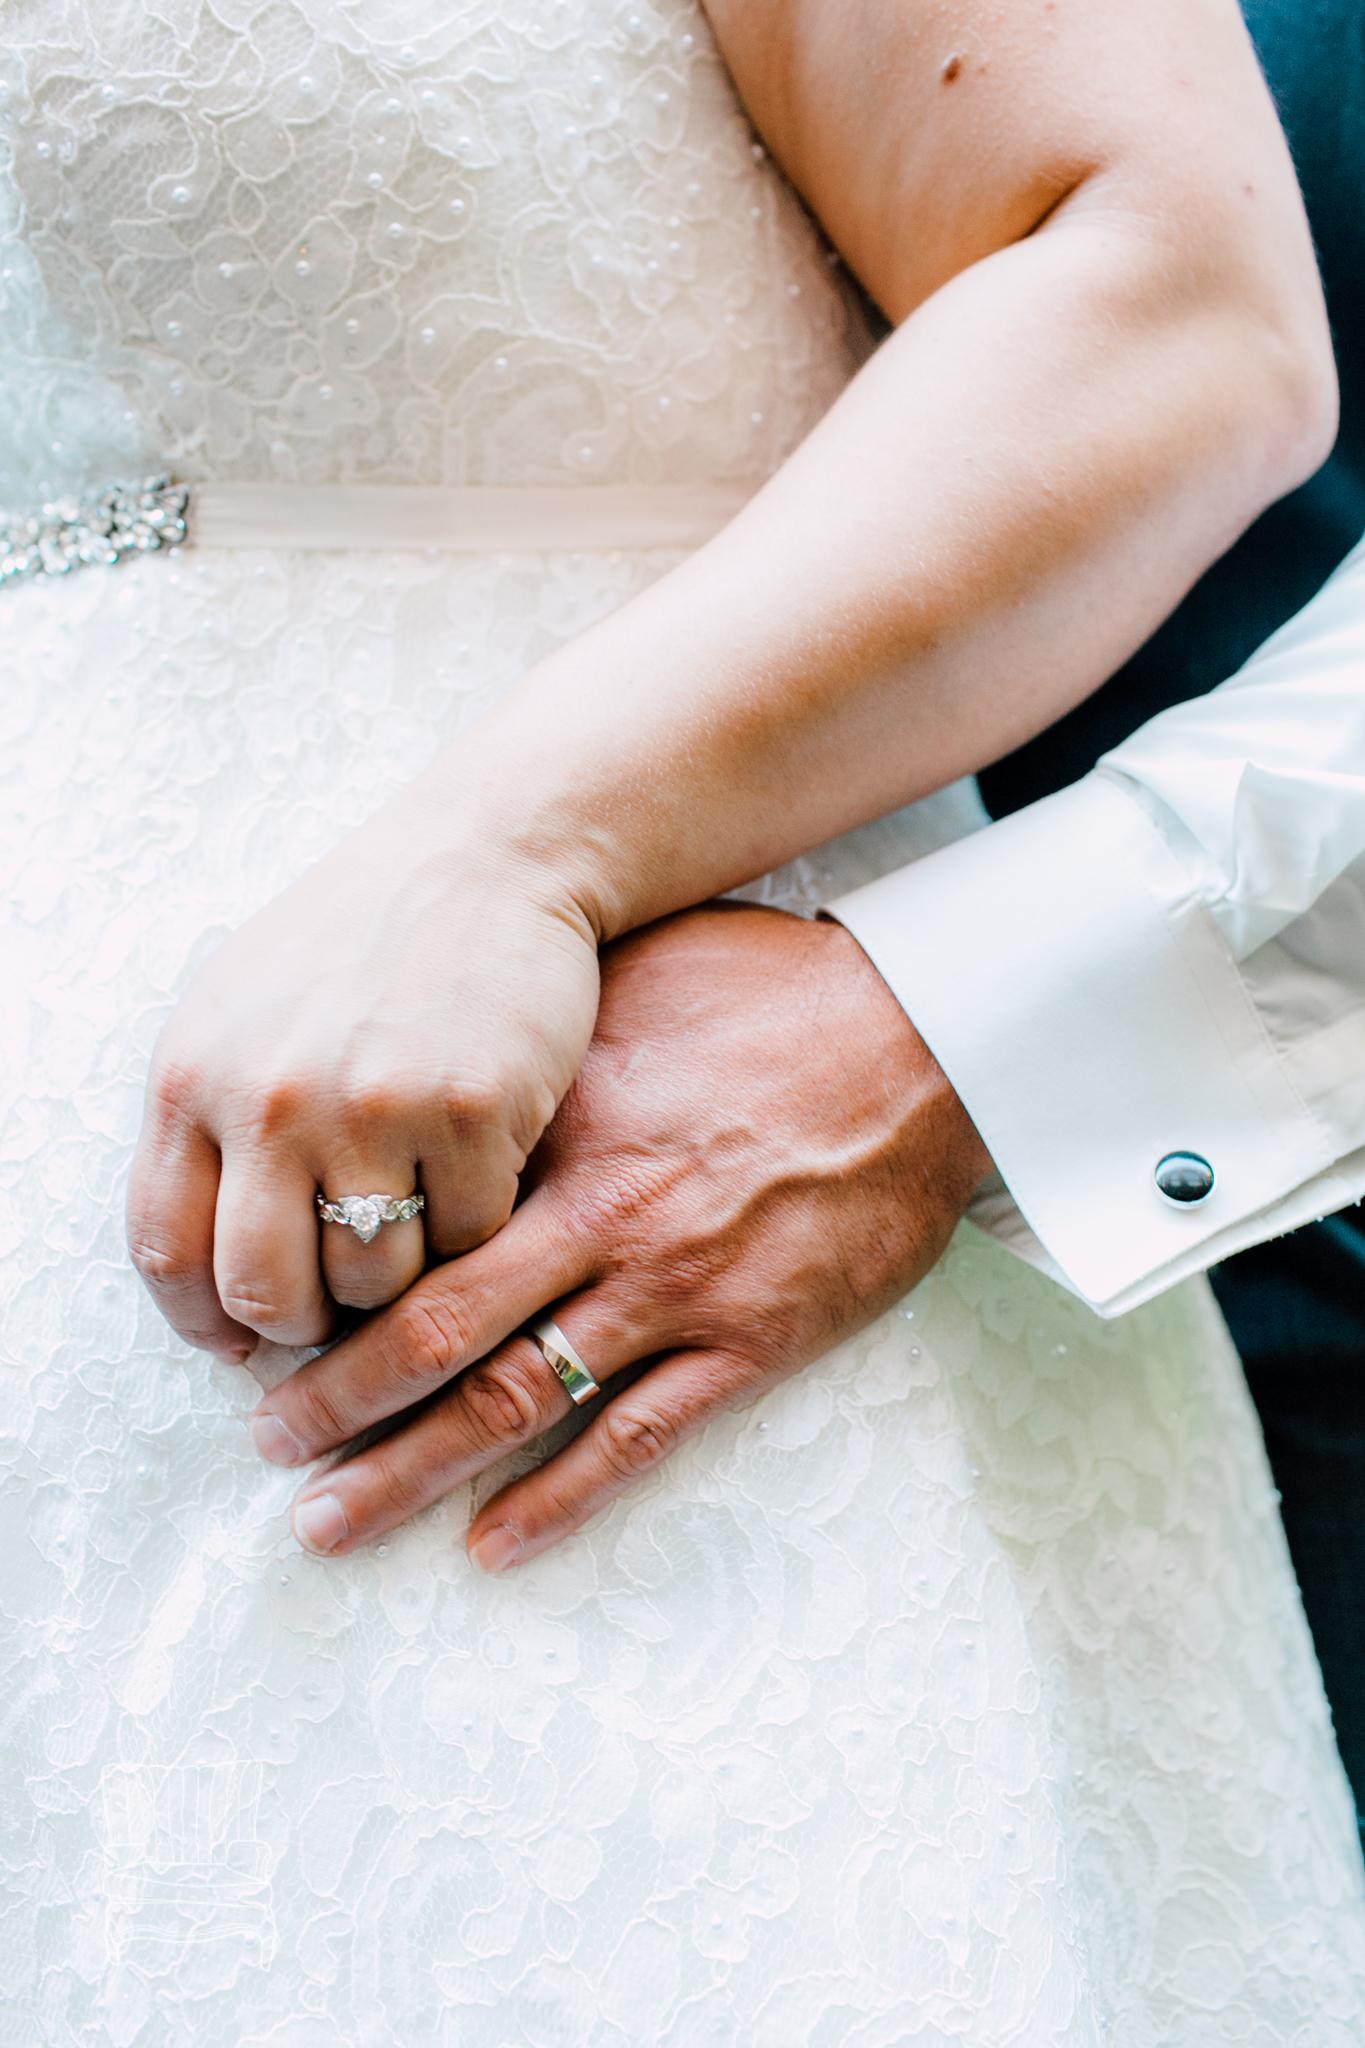 whatcom-museum-wedding-bribran-2-2.jpg